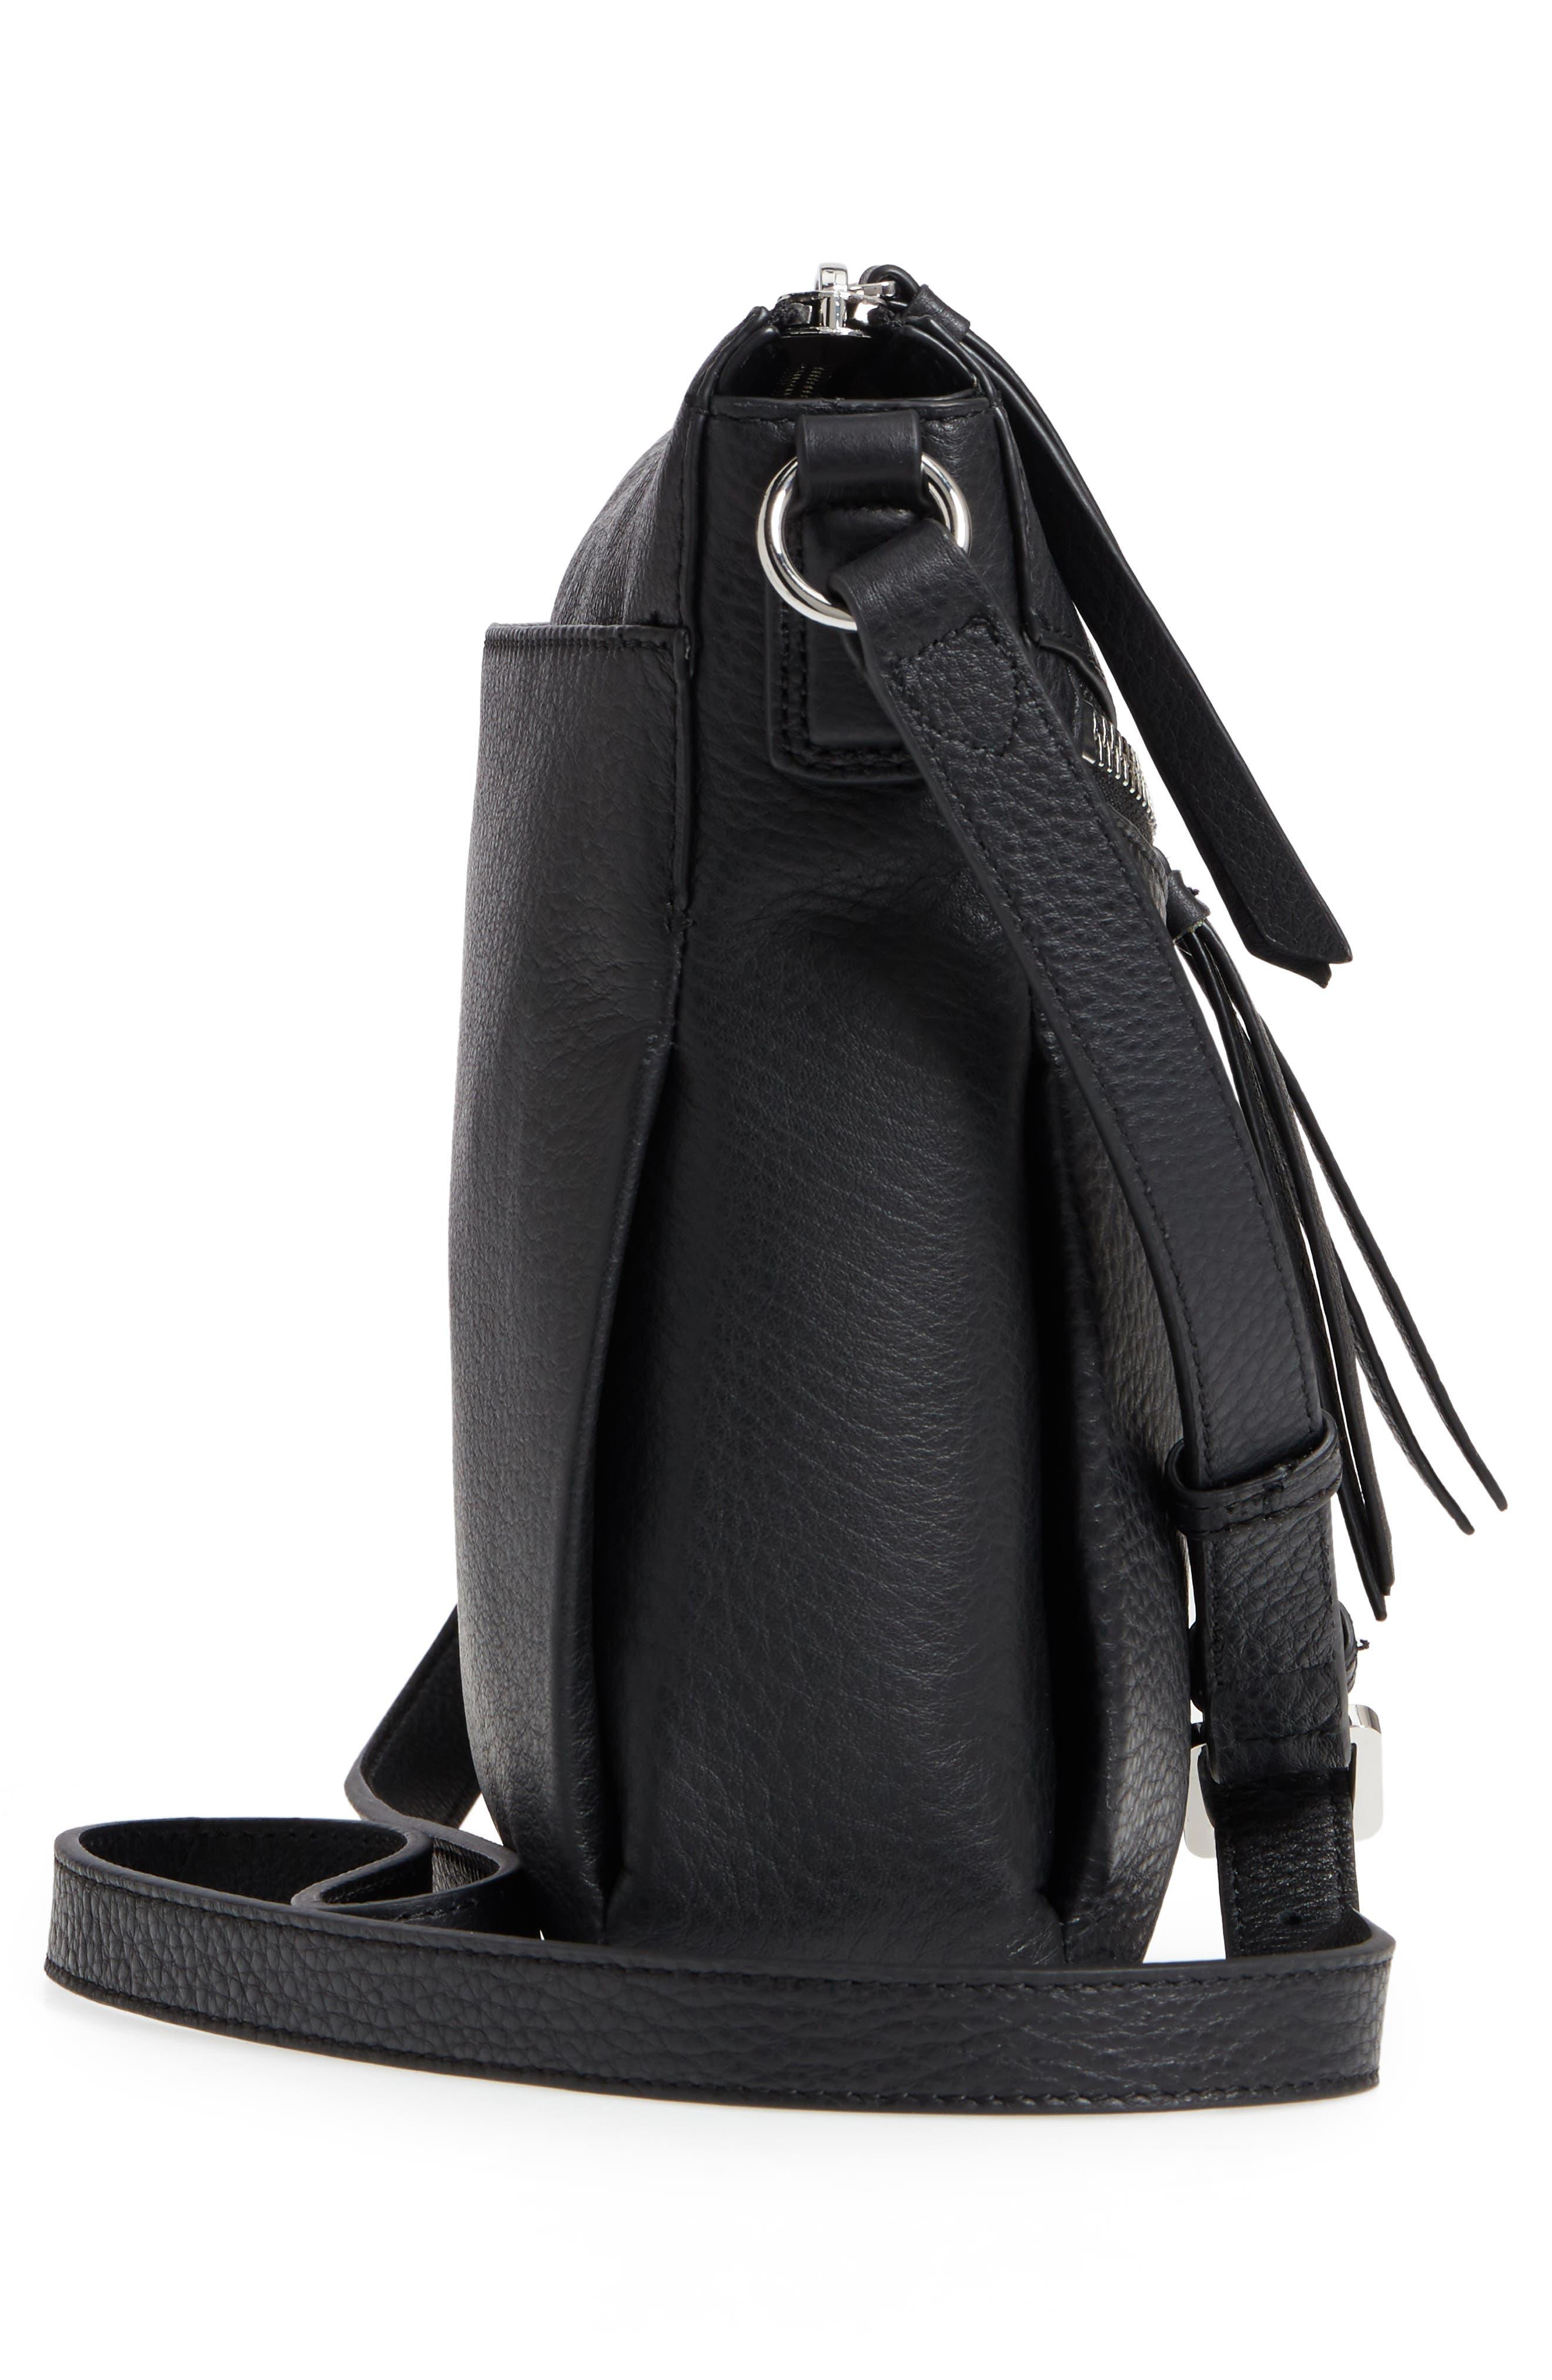 Staja Leather Crossbody Bag,                             Alternate thumbnail 6, color,                             Nero